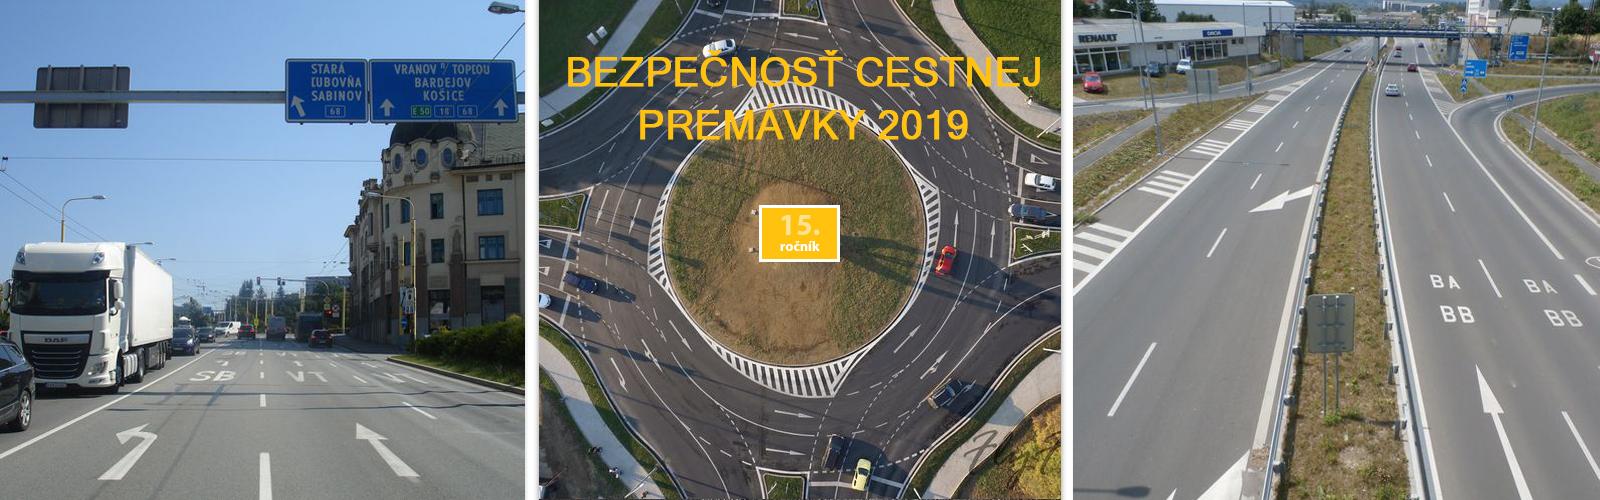 becep 2019 slider